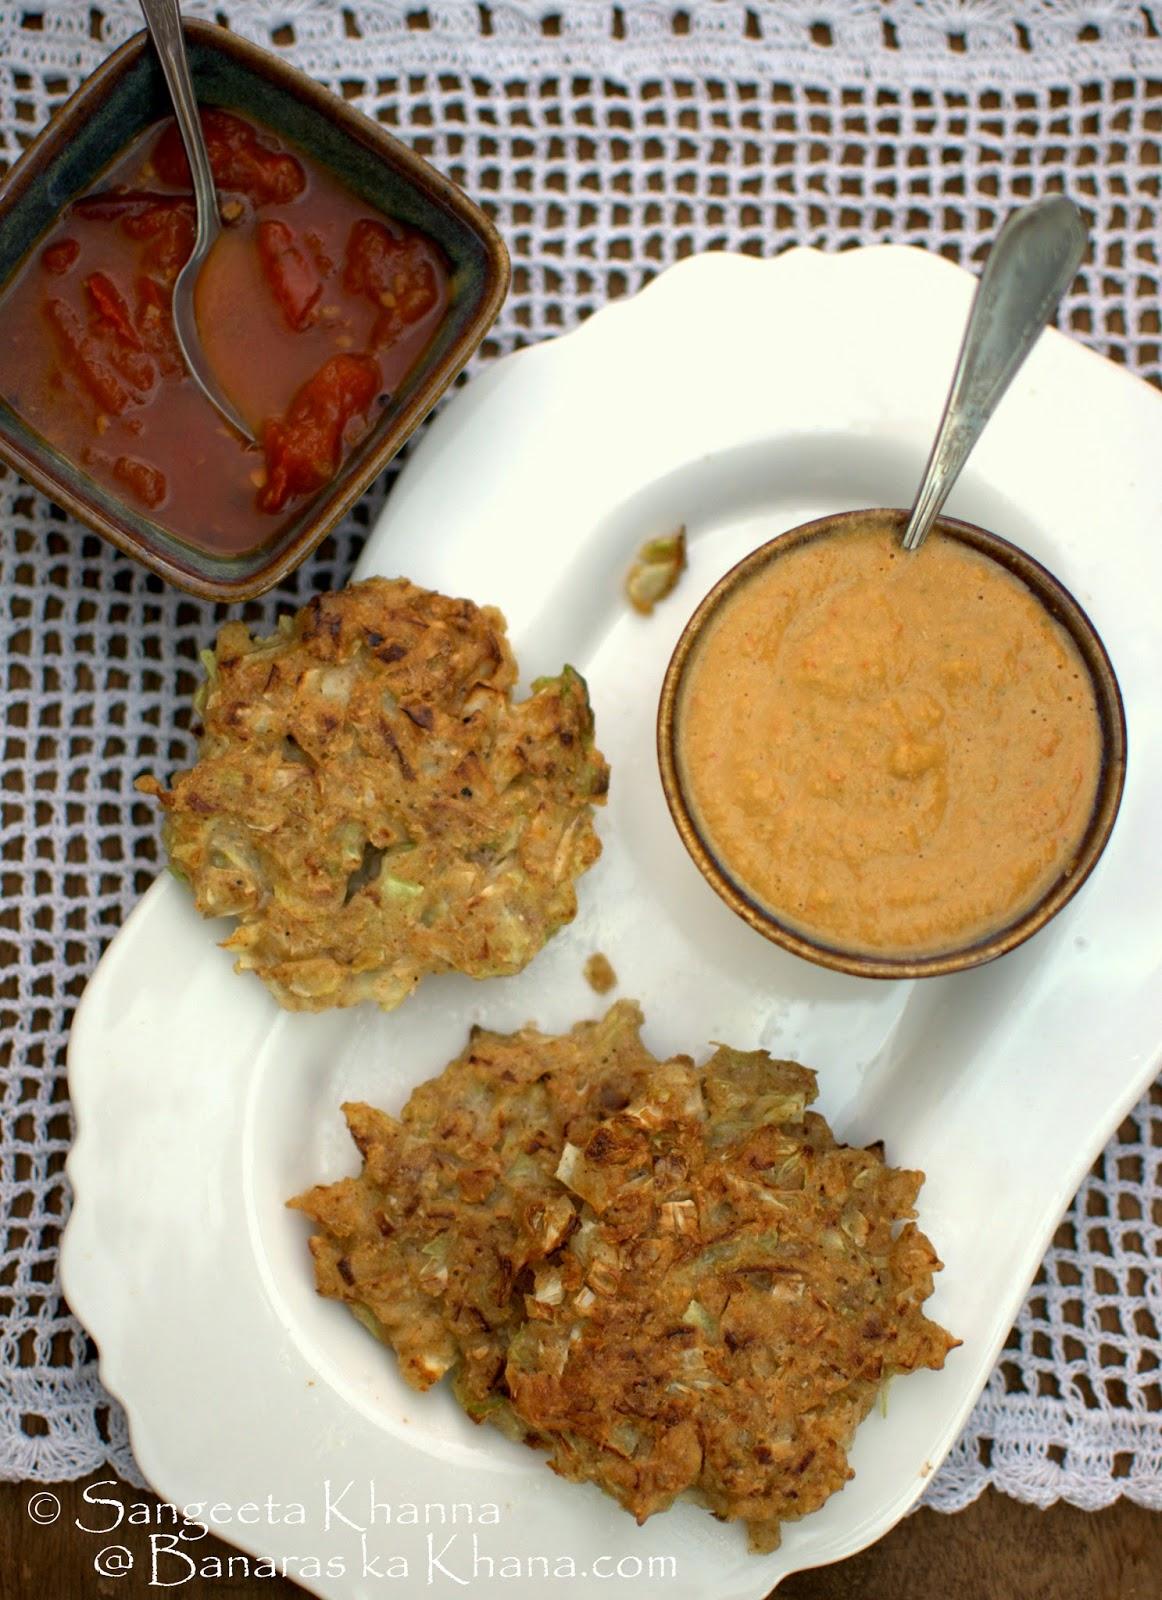 101 gluten free breakfasts : buckwheat-cabbage savoury pancakes with a sesame dip